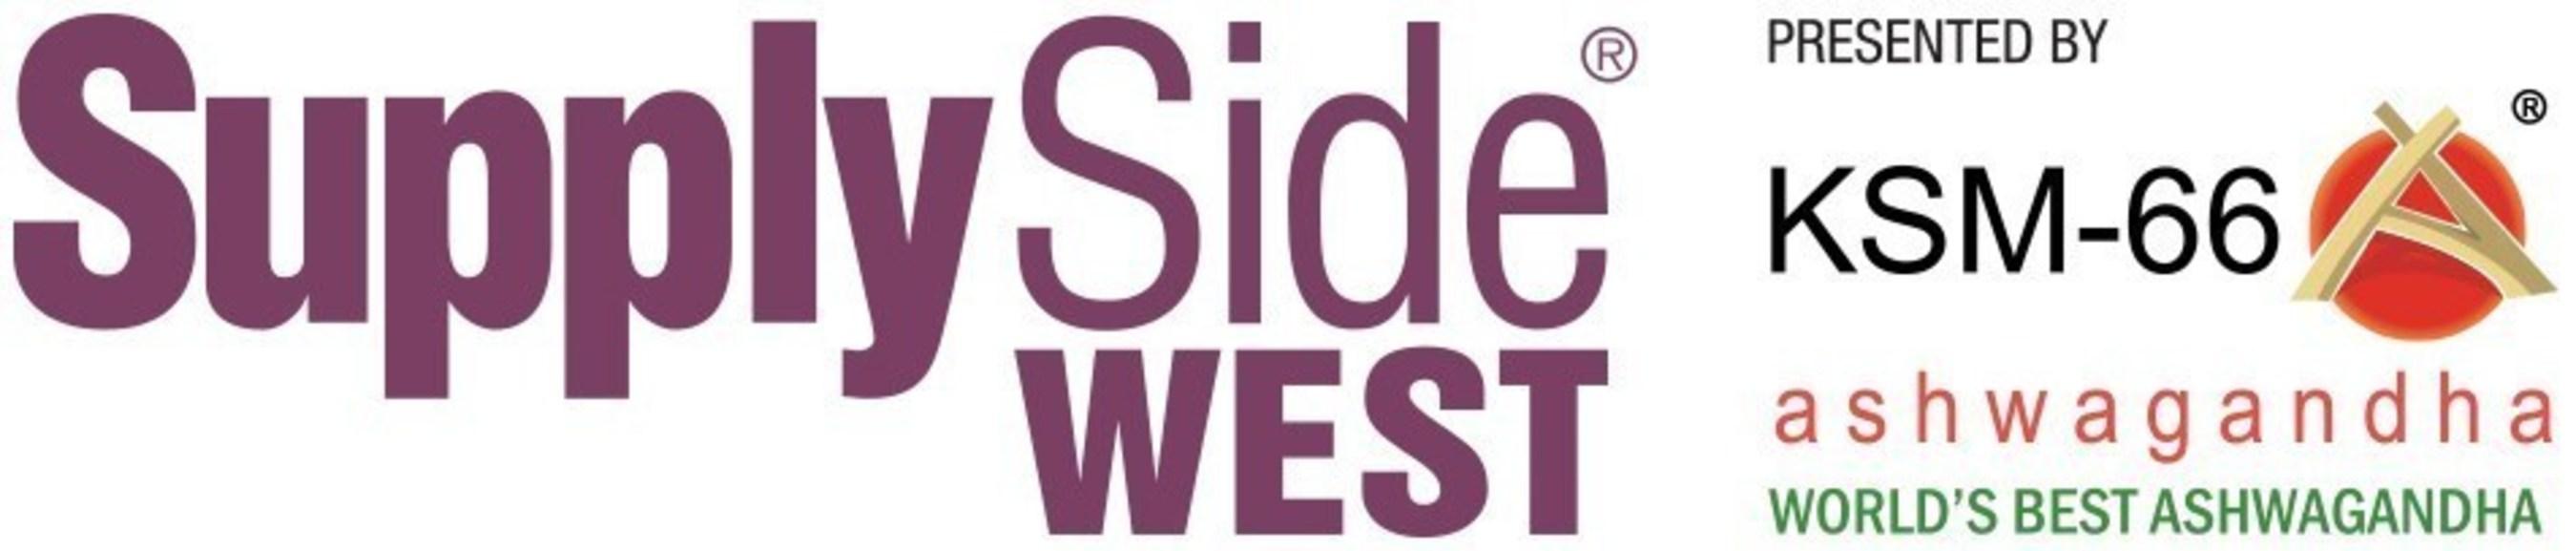 SupplySide West 2016